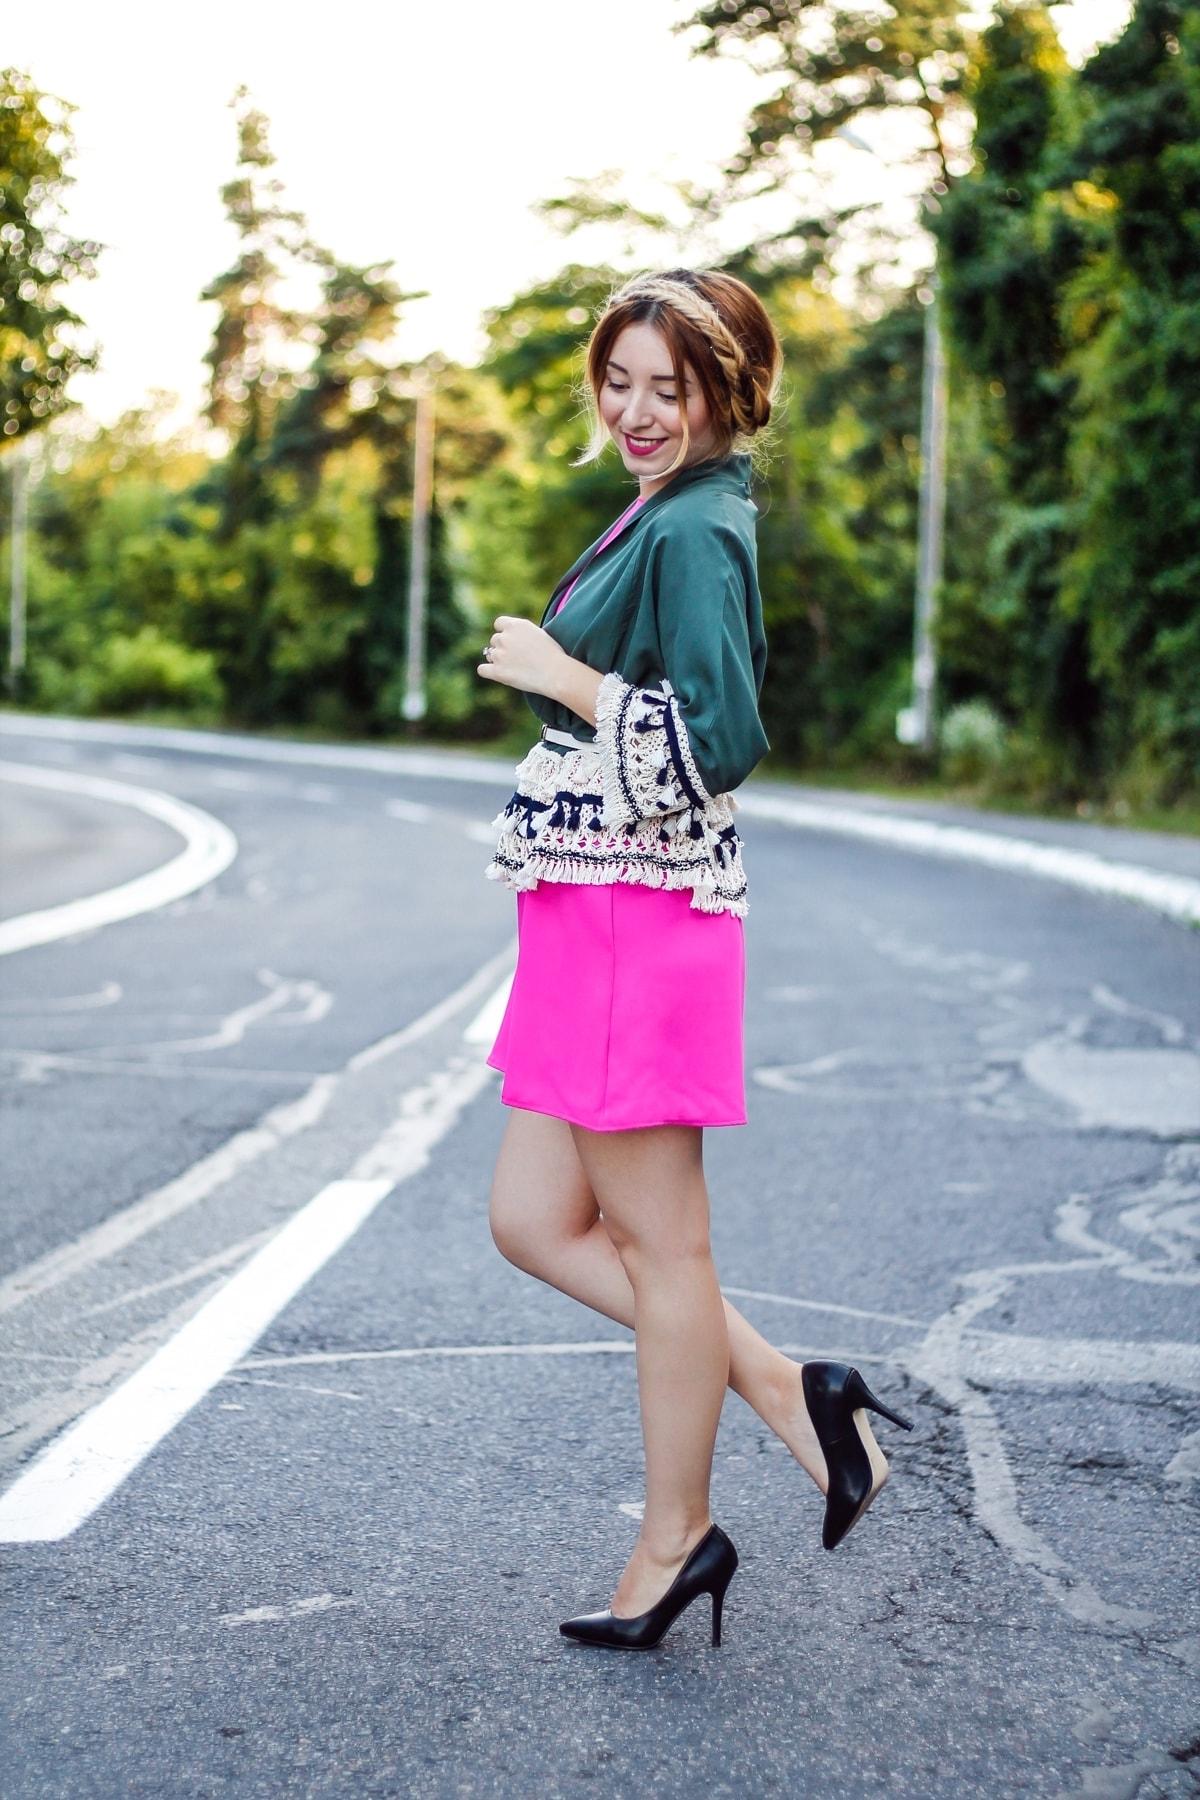 andreea ristea - rochie roz fucsia, tinuta colorata de vara